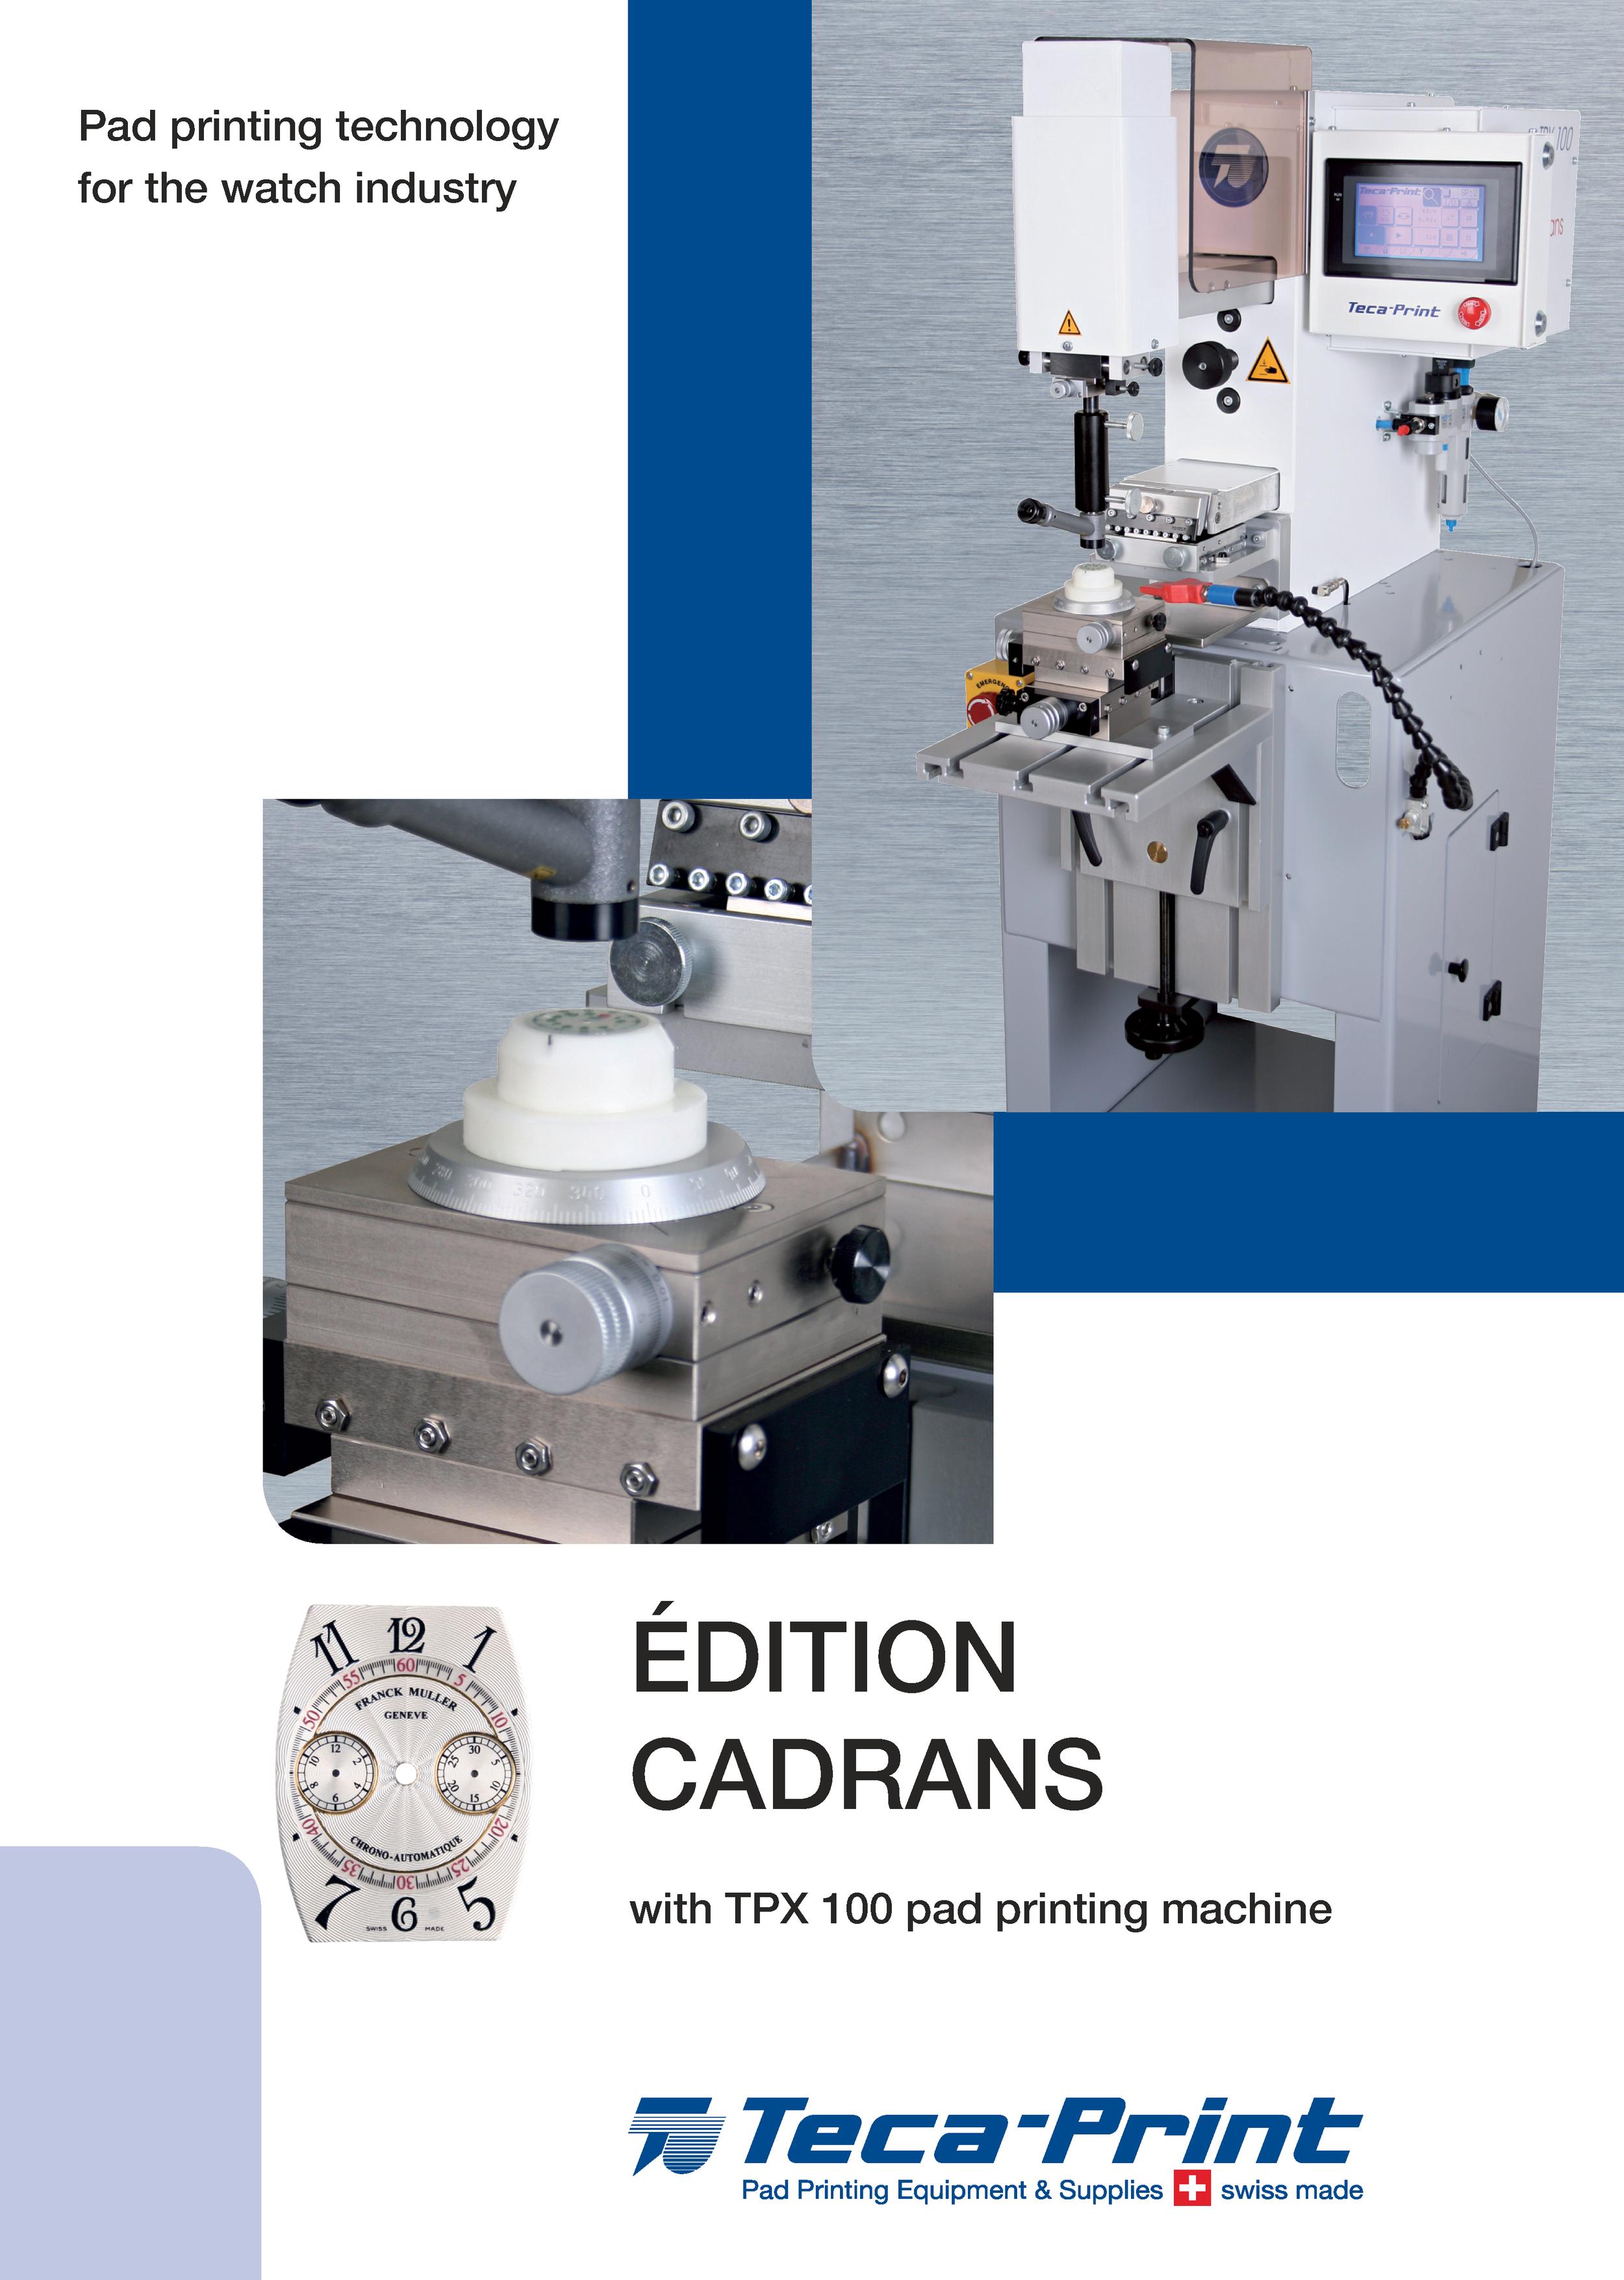 TPX _100_Edition_Cadrans_EN_Page_1.png